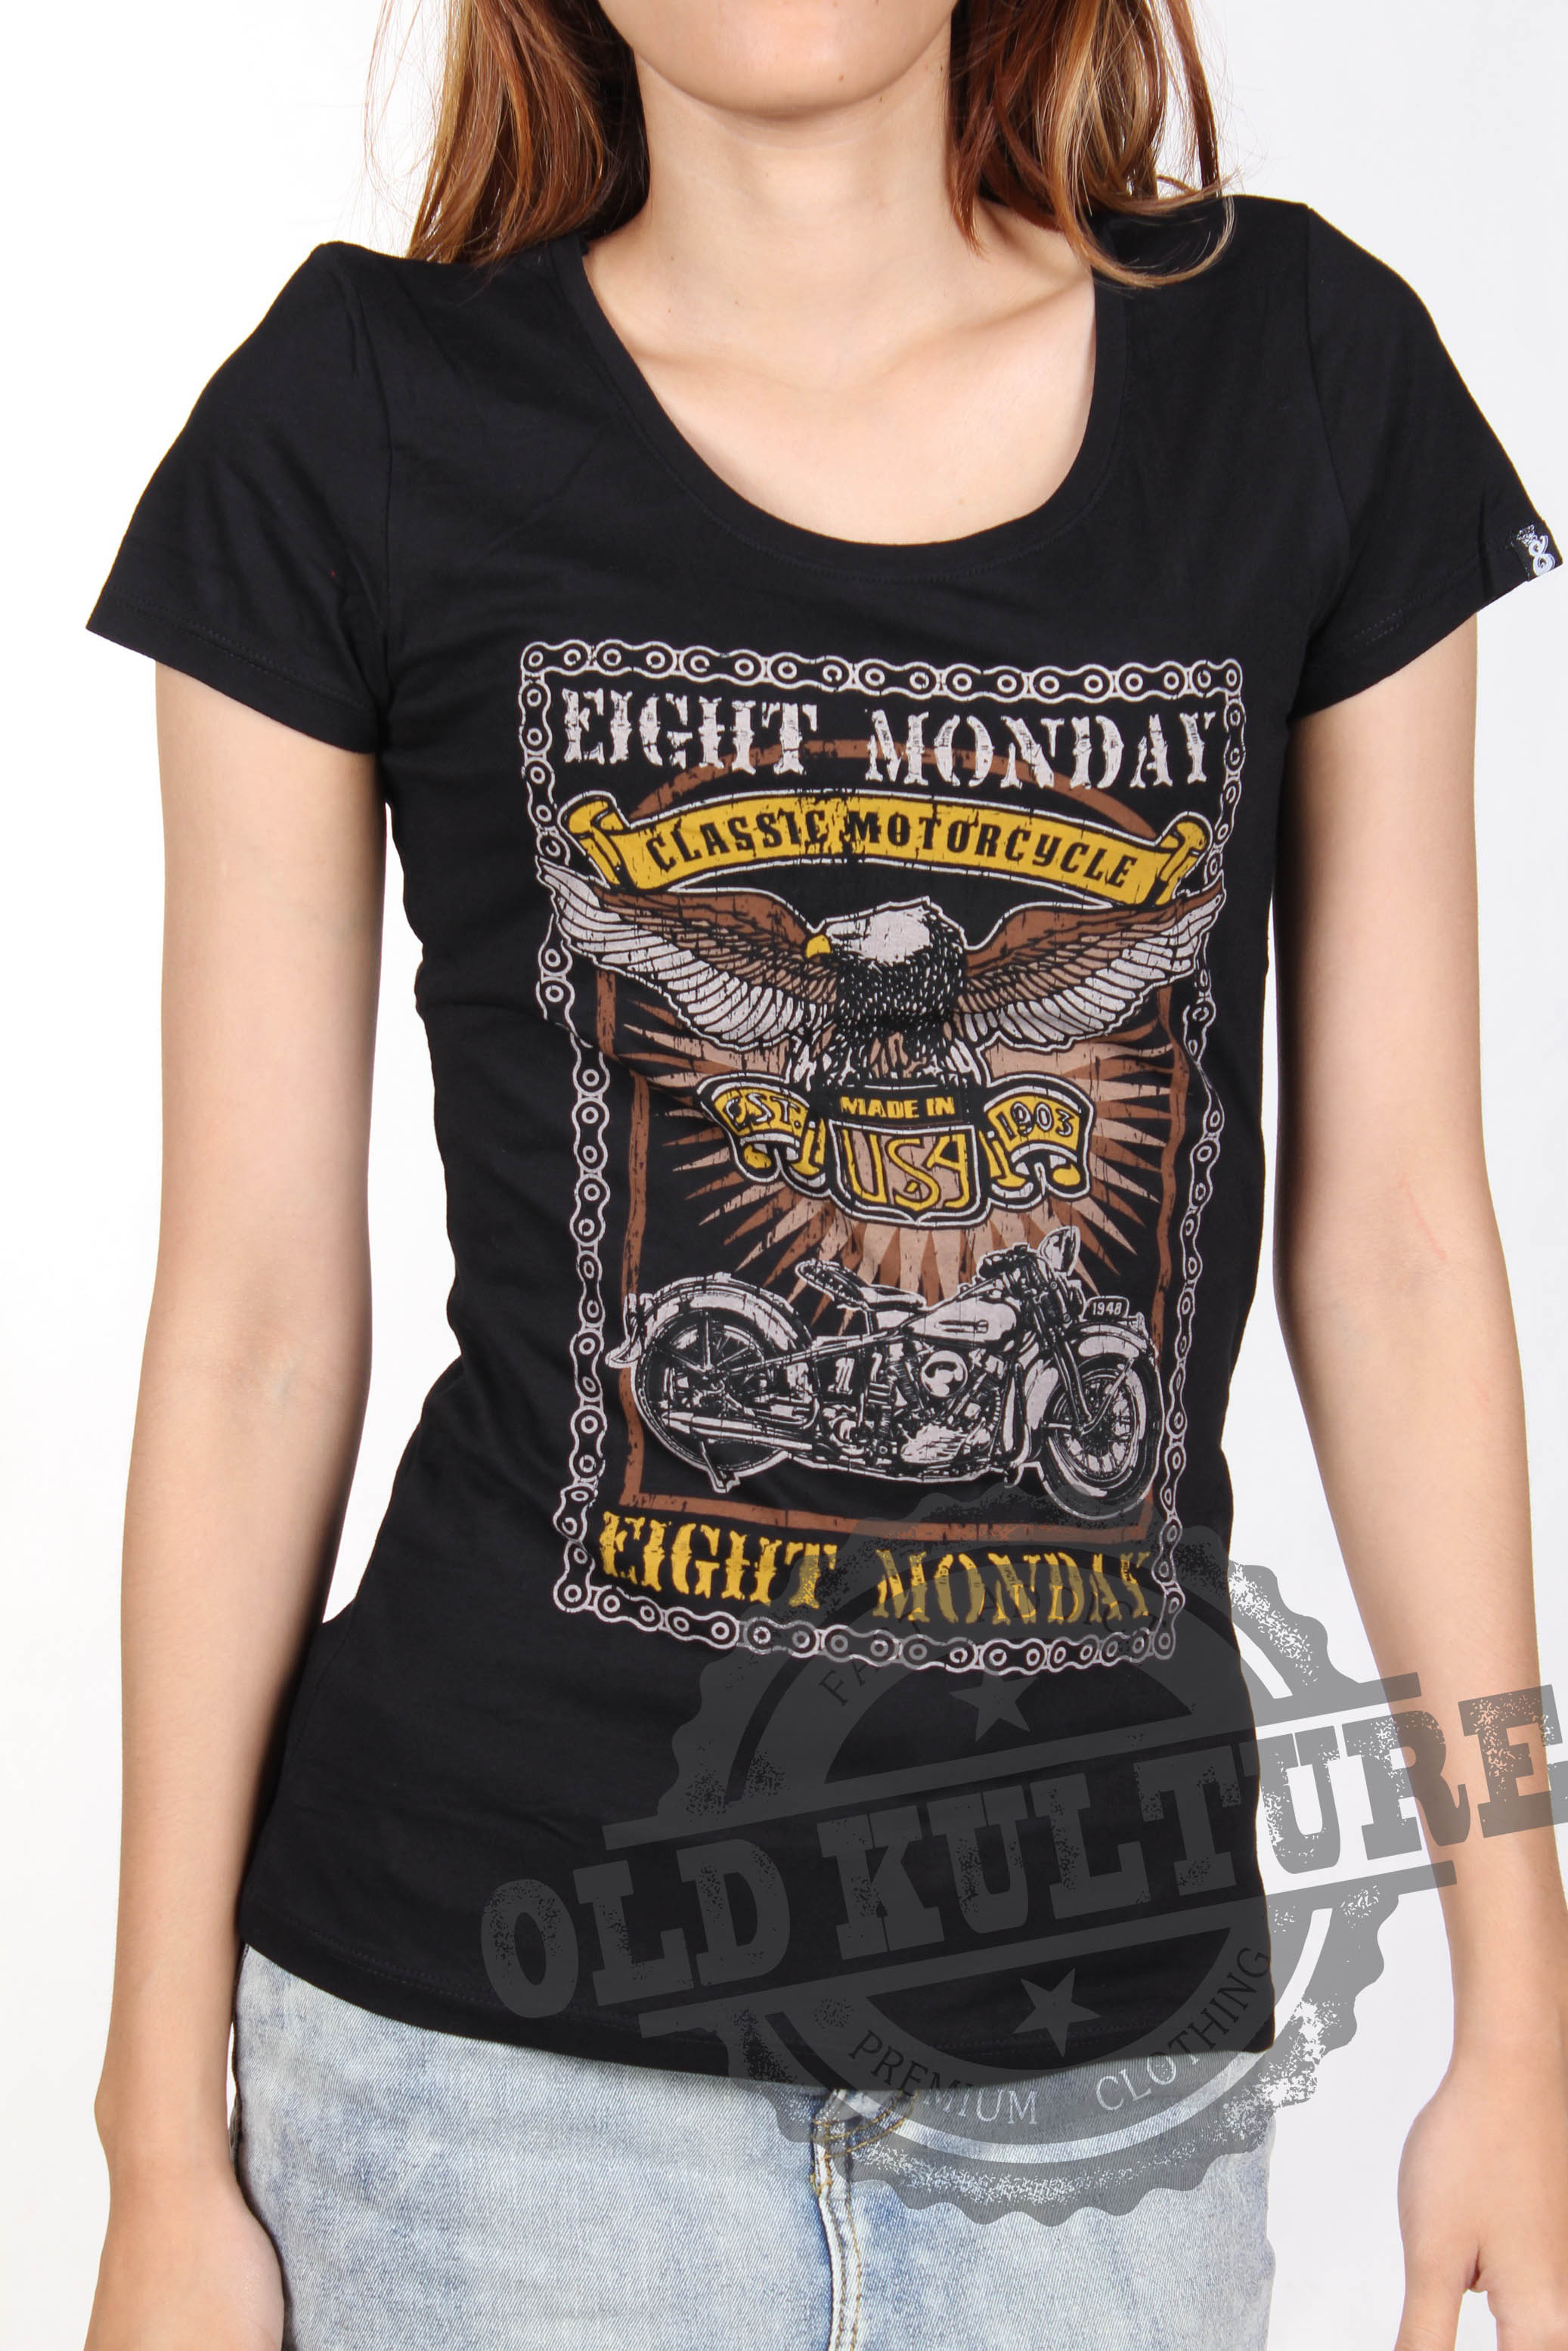 eight_monday_rockabilly_vintage_eagle_harley_west_coast_chopper_motorcycle_t_shirts_4.jpg